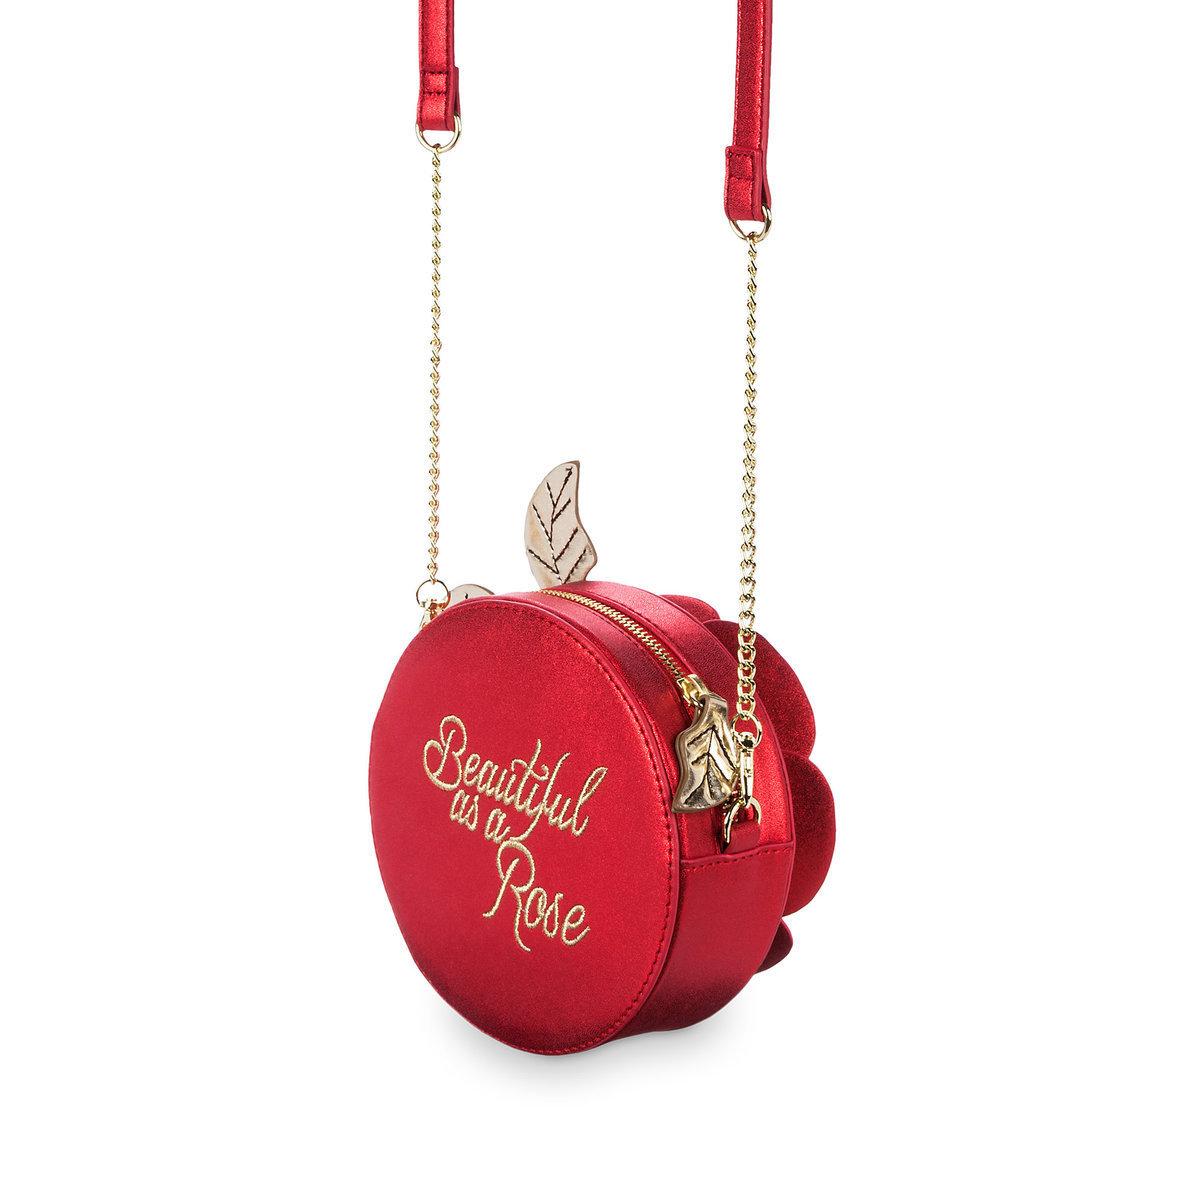 Женская сумочка «Роза» Disney от Danielle Nicole - «Красавица и Чудовище»